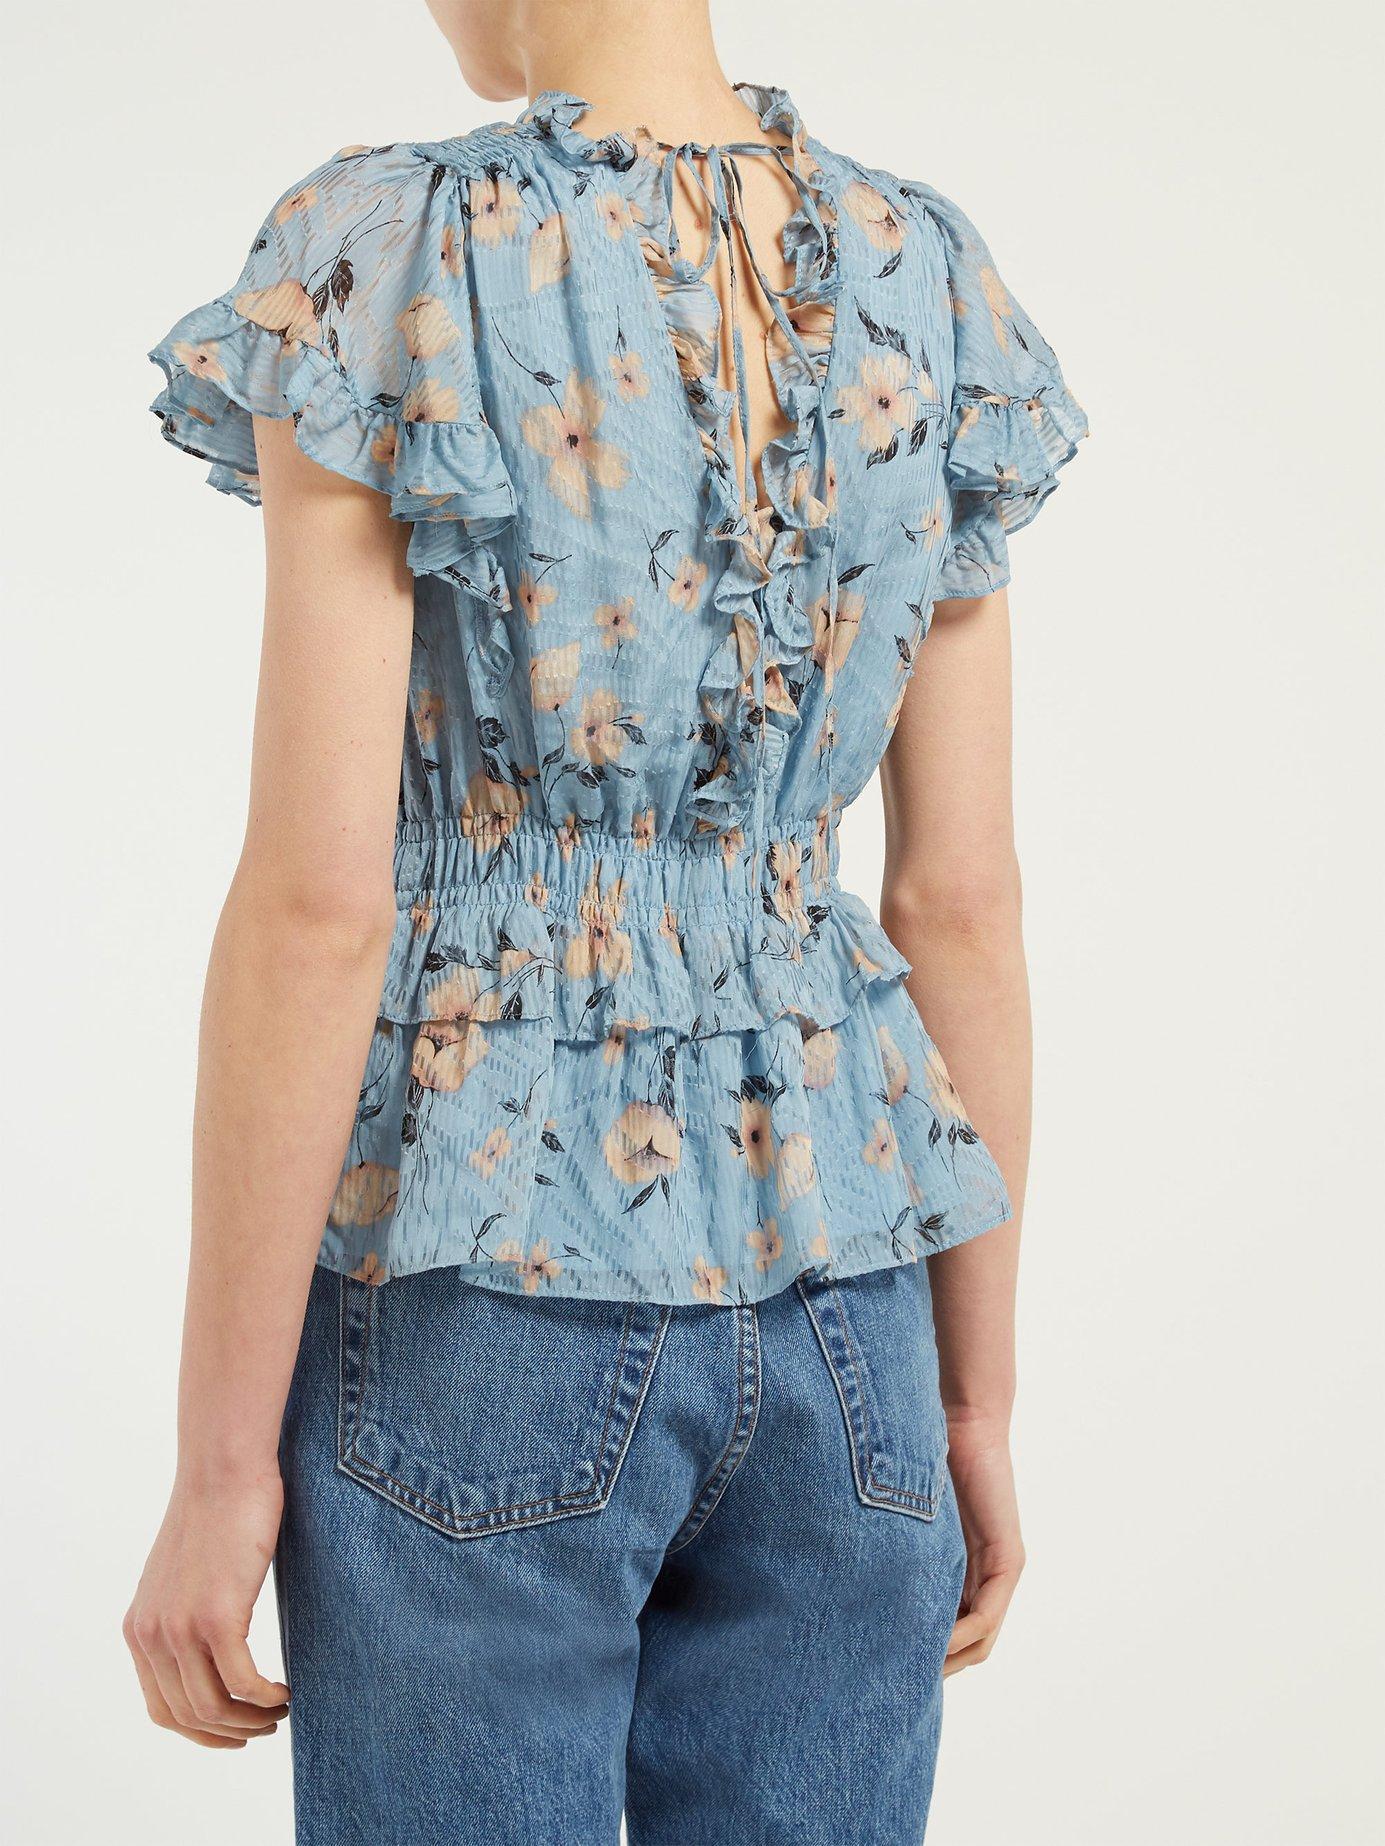 54014d24a28fc Rebecca Taylor - Blue Floral Print Ruffled Silk Blend Blouse - Lyst. View  fullscreen